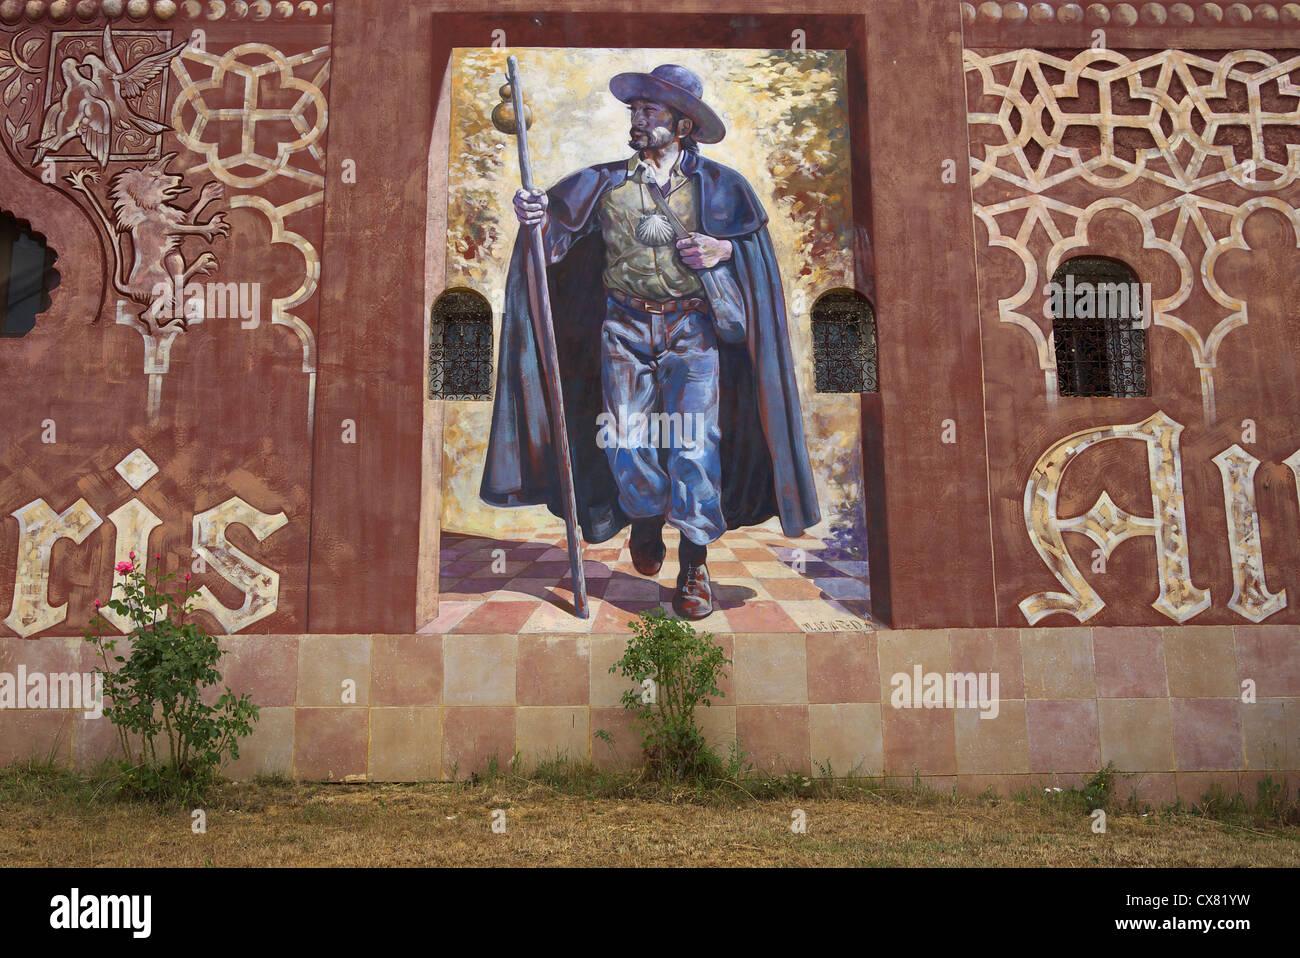 Mural of a pilgrim on the road to Santiago at the albergue Viatoris in Sahagun, Spain. - Stock Image